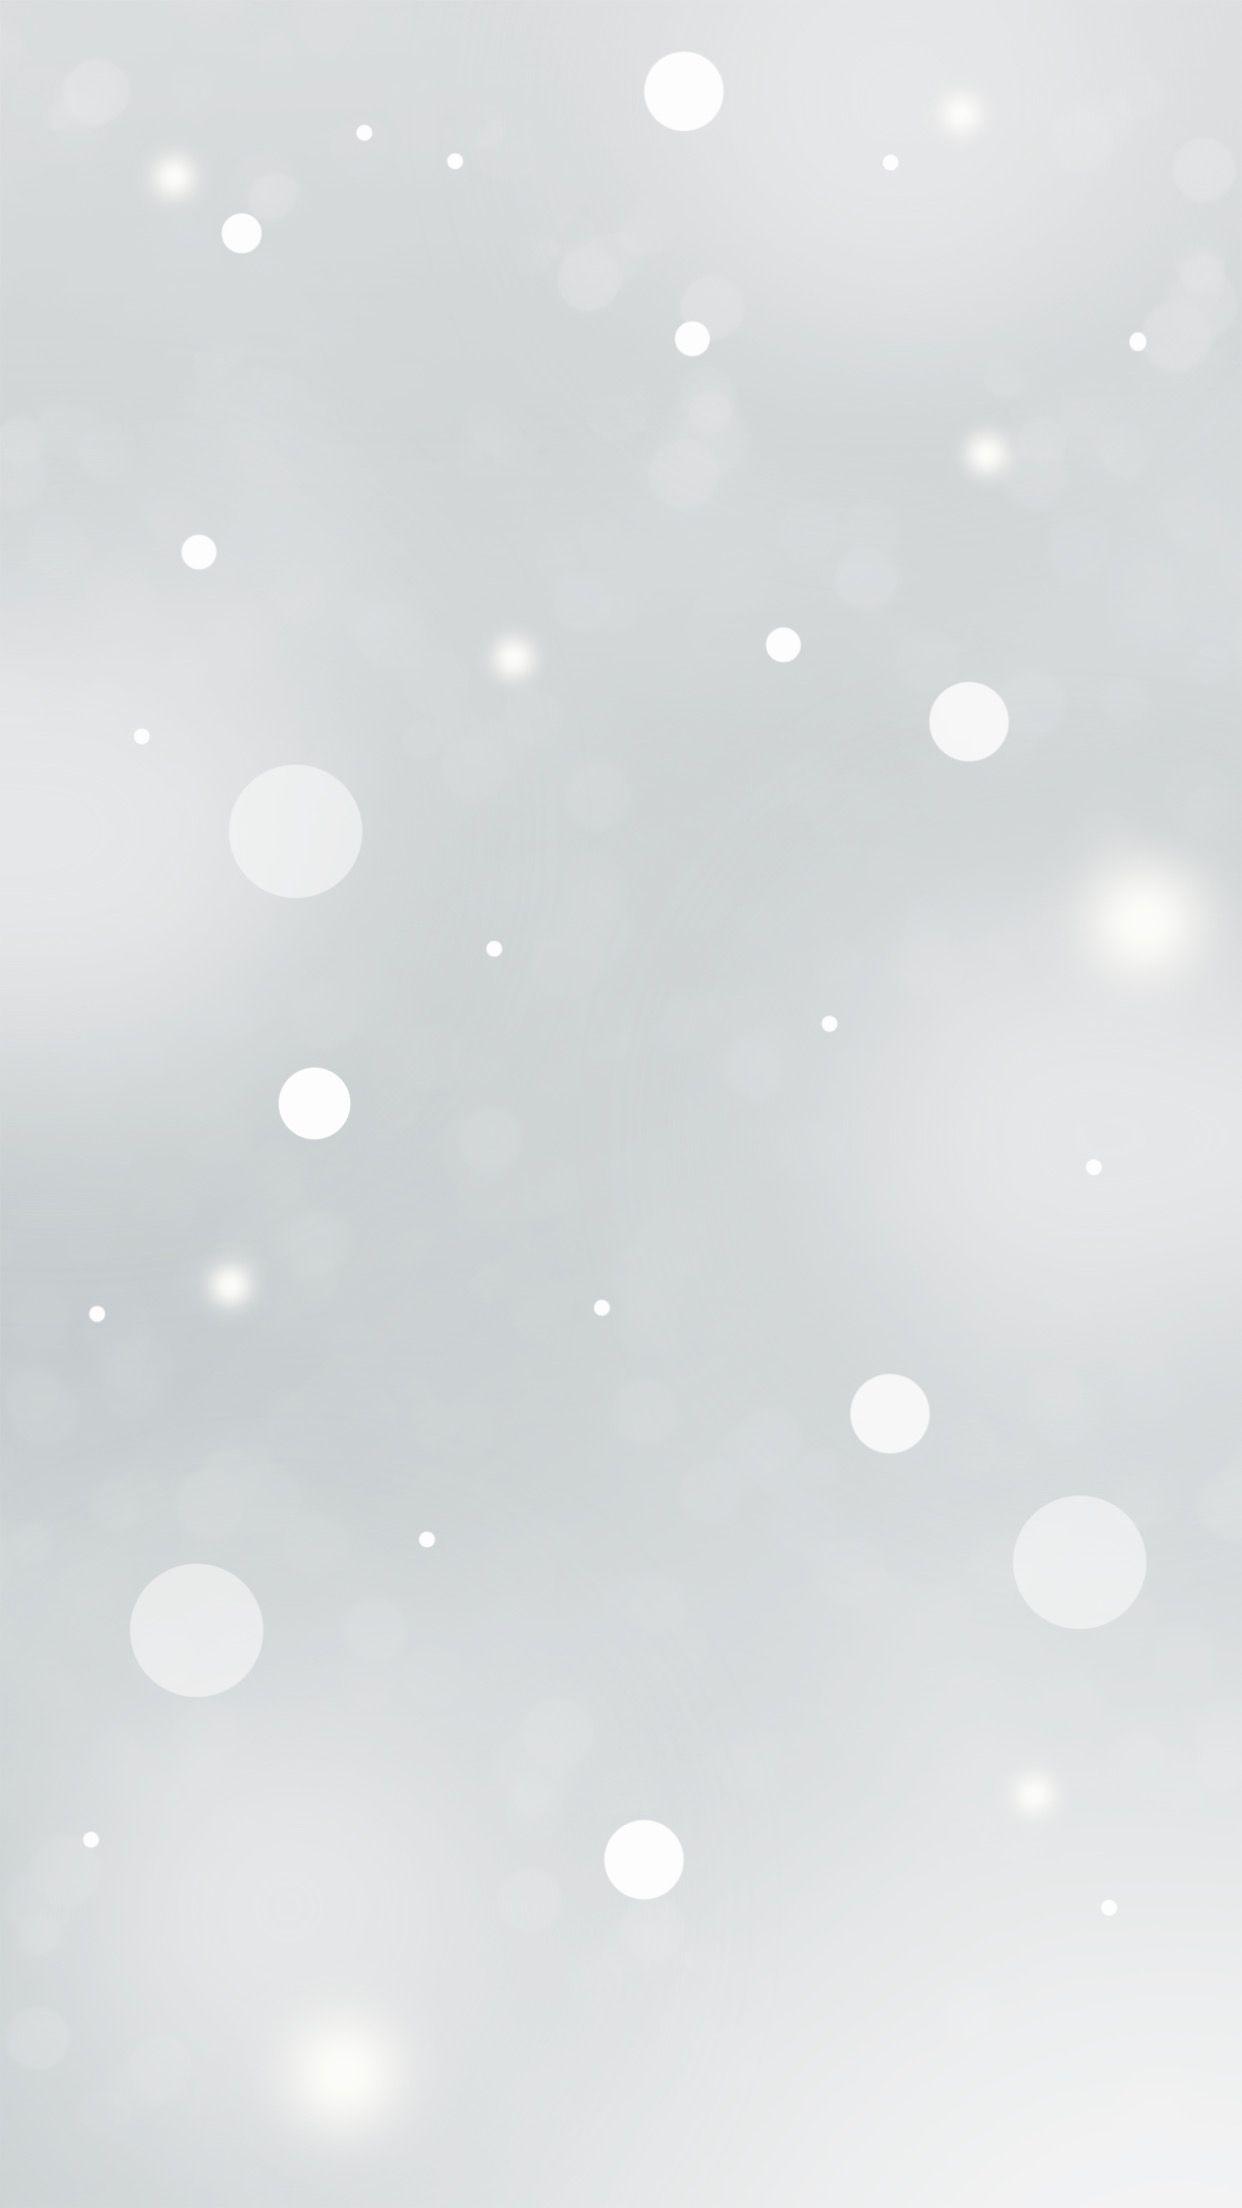 Christmas White Bokeh Iphone Wallpaper Wallpaper Iphone Christmas Silver Christmas Wallpaper Apple Watch Wallpaper